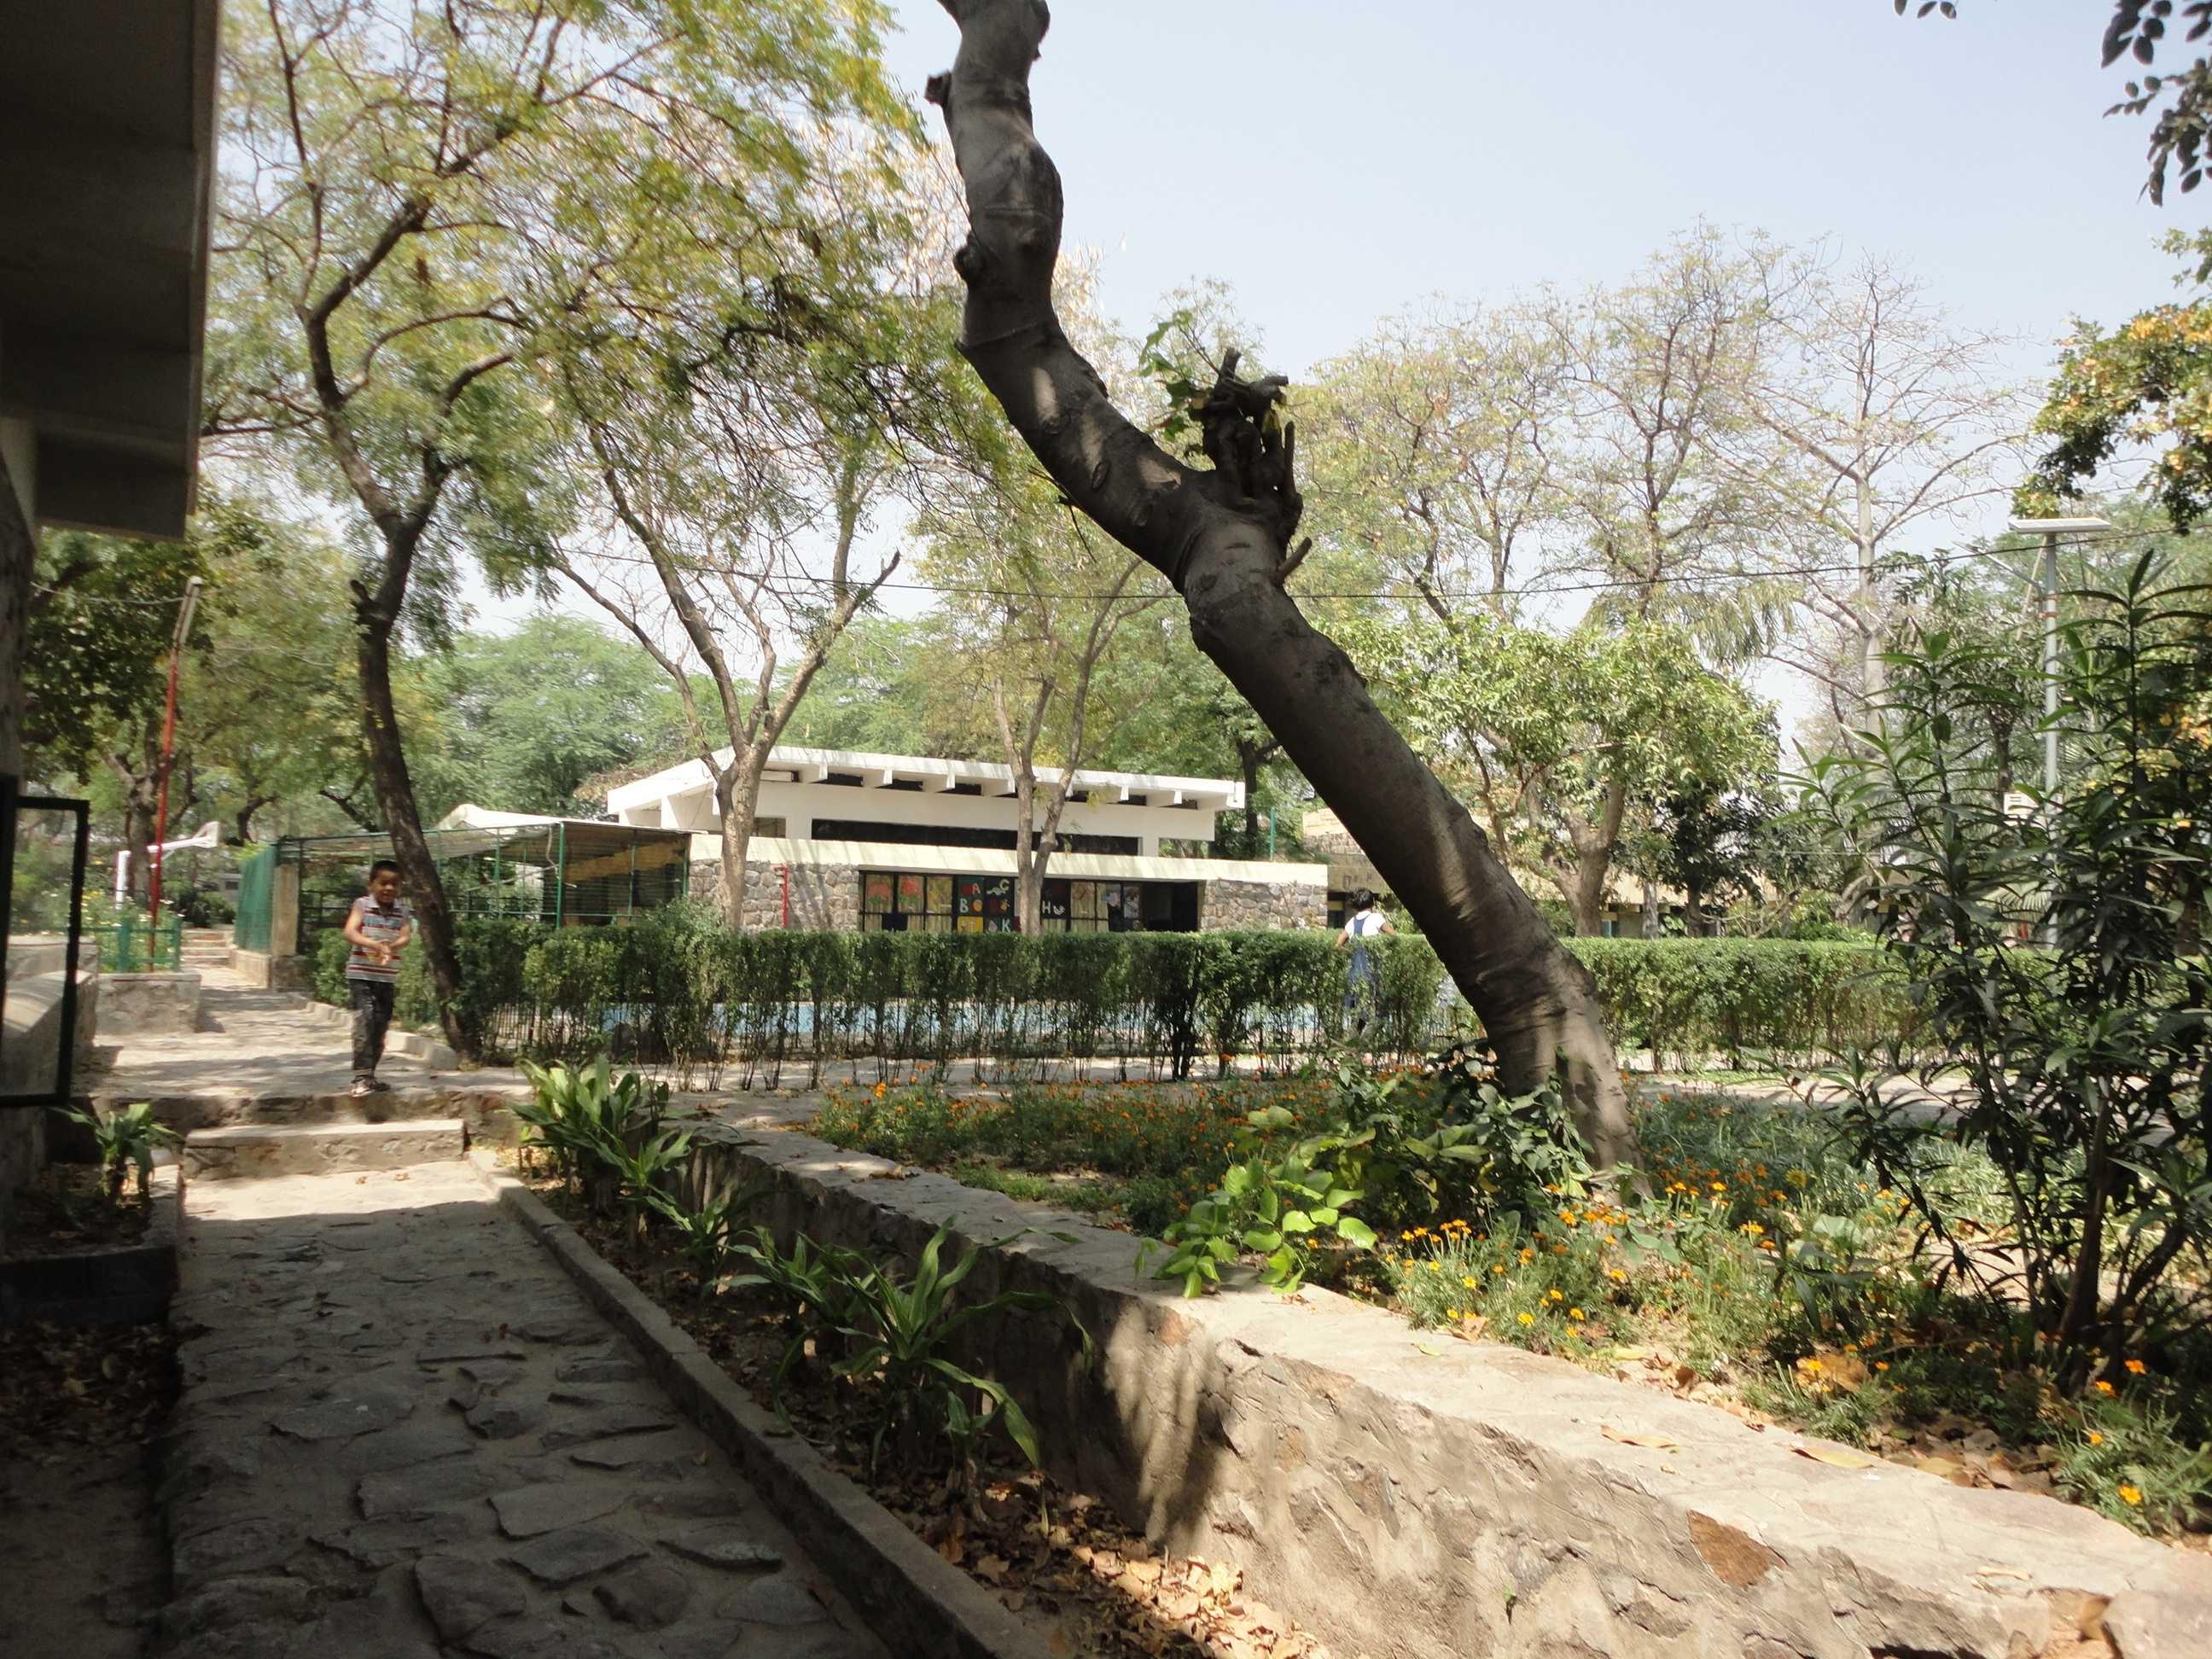 SOS Children's Village in Faridabad